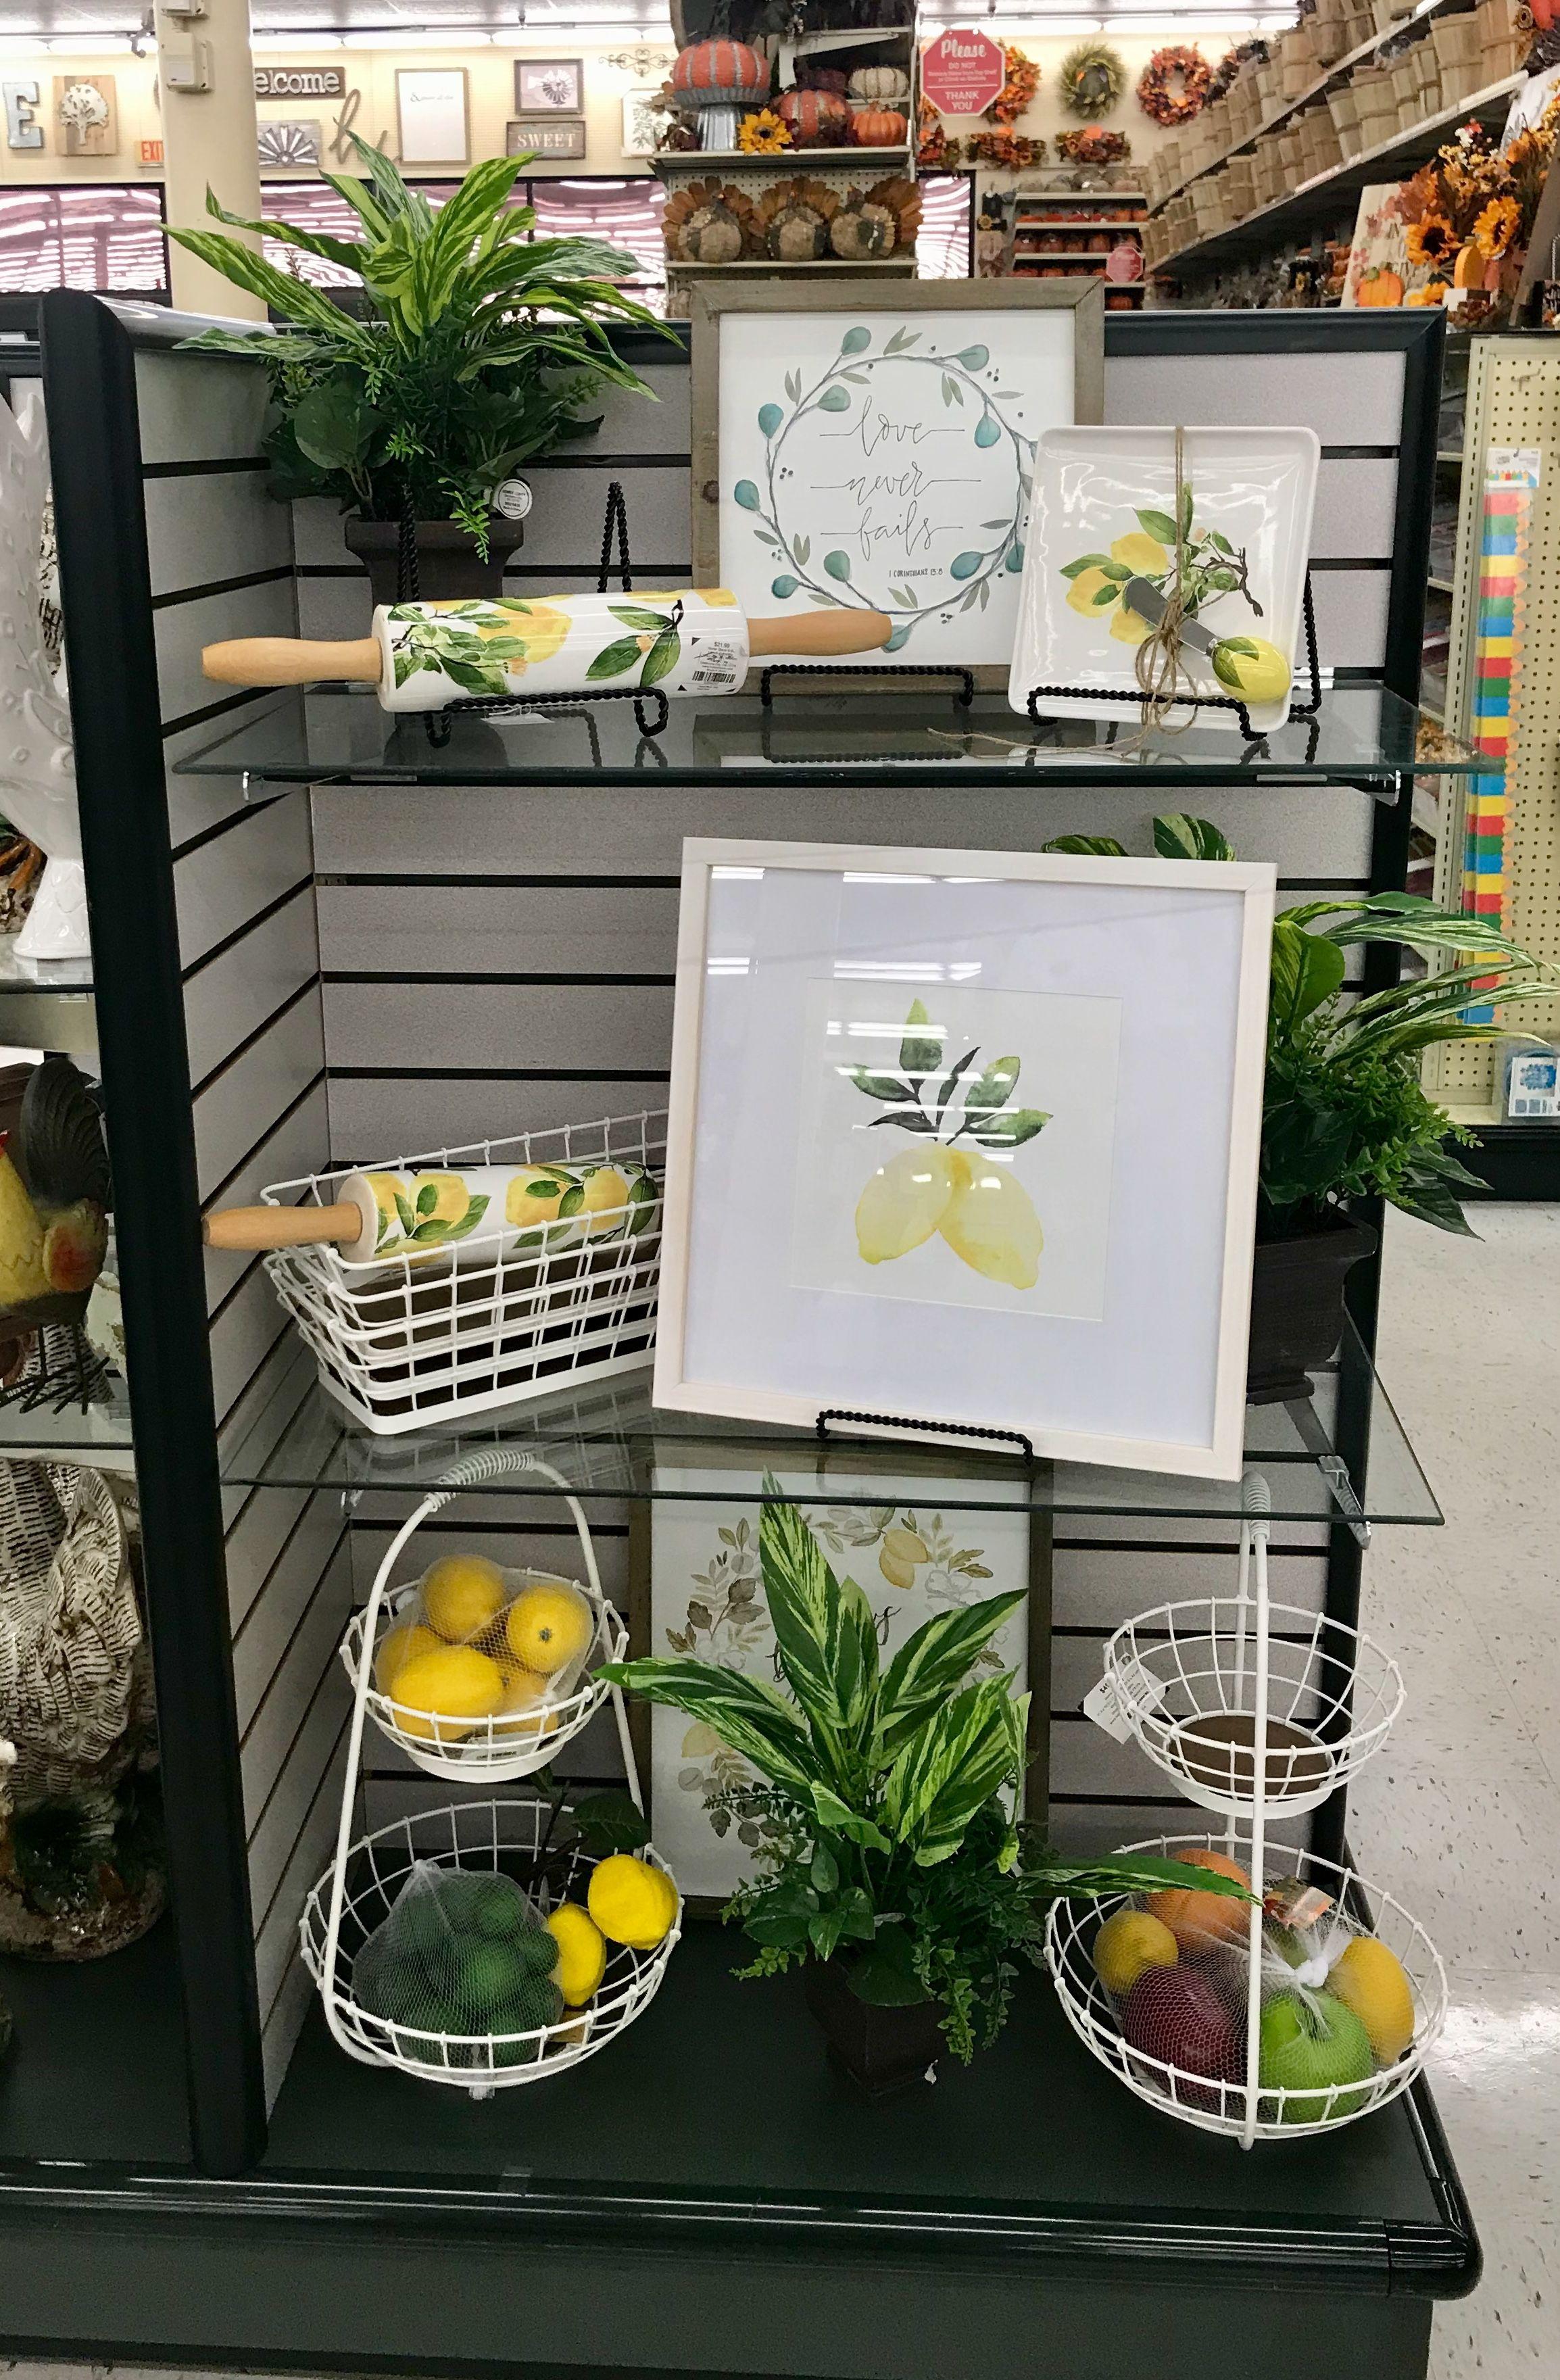 Hobby Lobby Merchandising Table Displays Work Lemon Kitchen